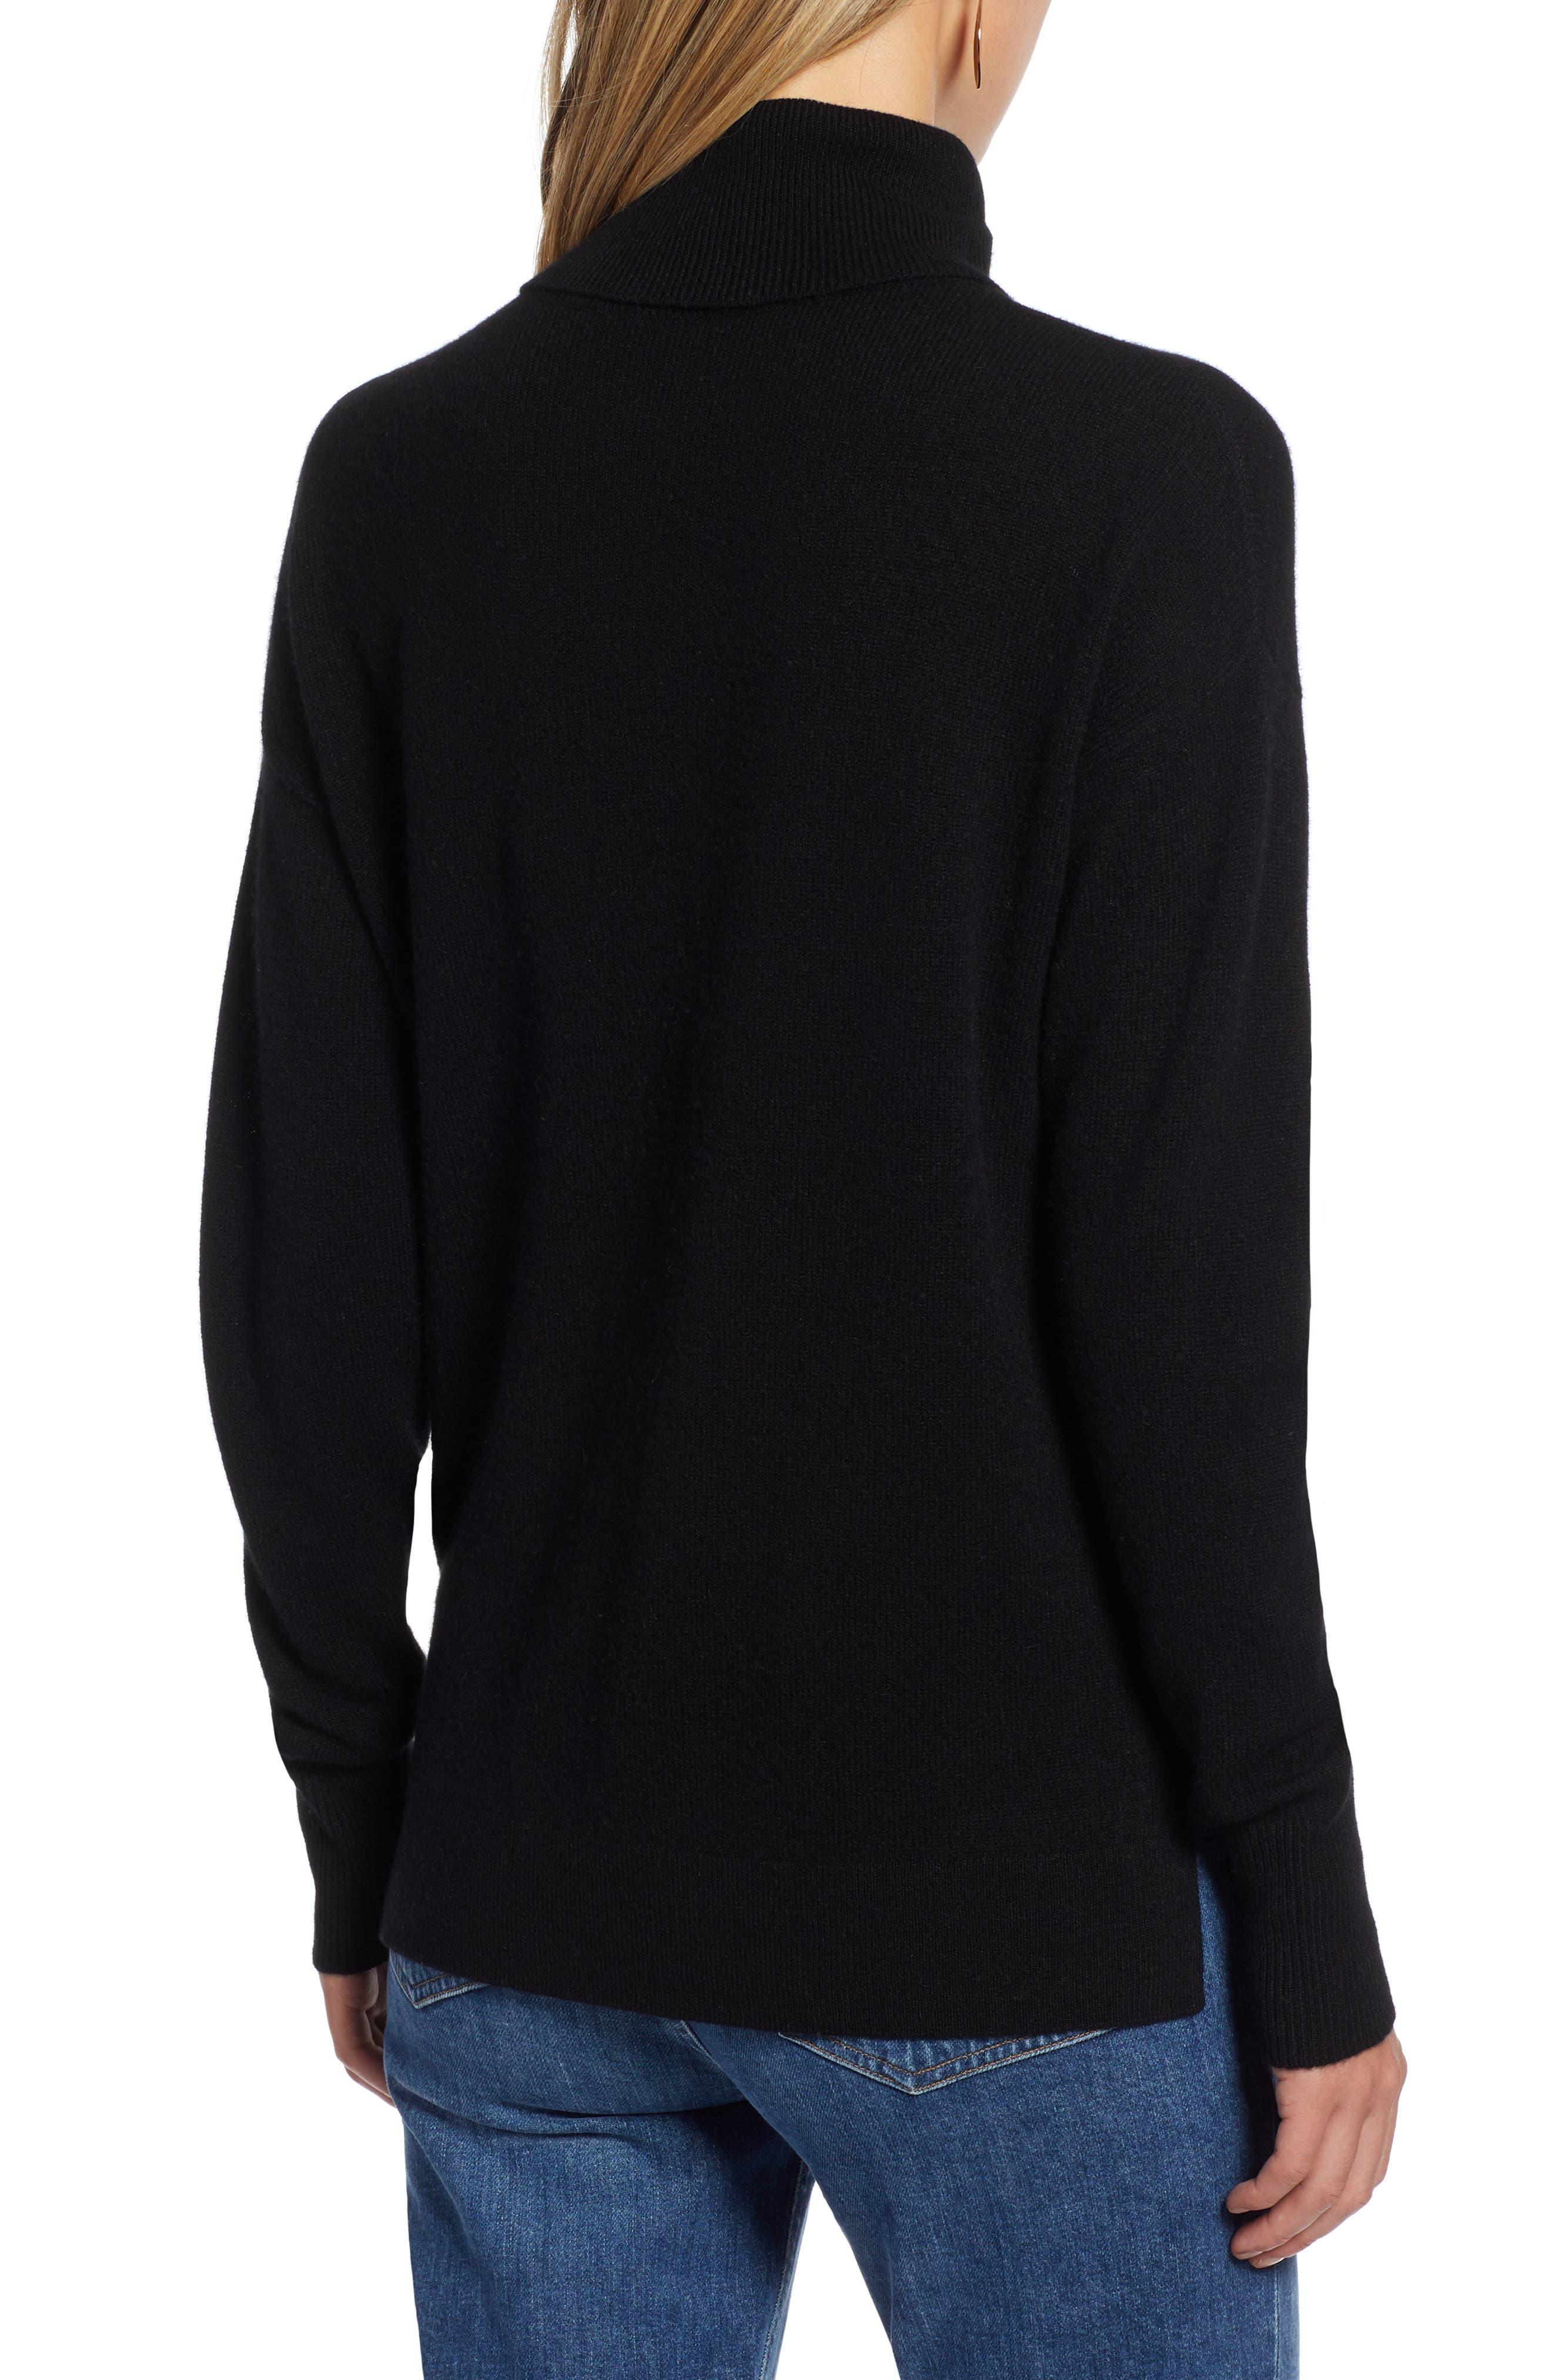 HALOGEN<SUP>®</SUP>, Cashmere Turtleneck Sweater, Alternate thumbnail 2, color, 001